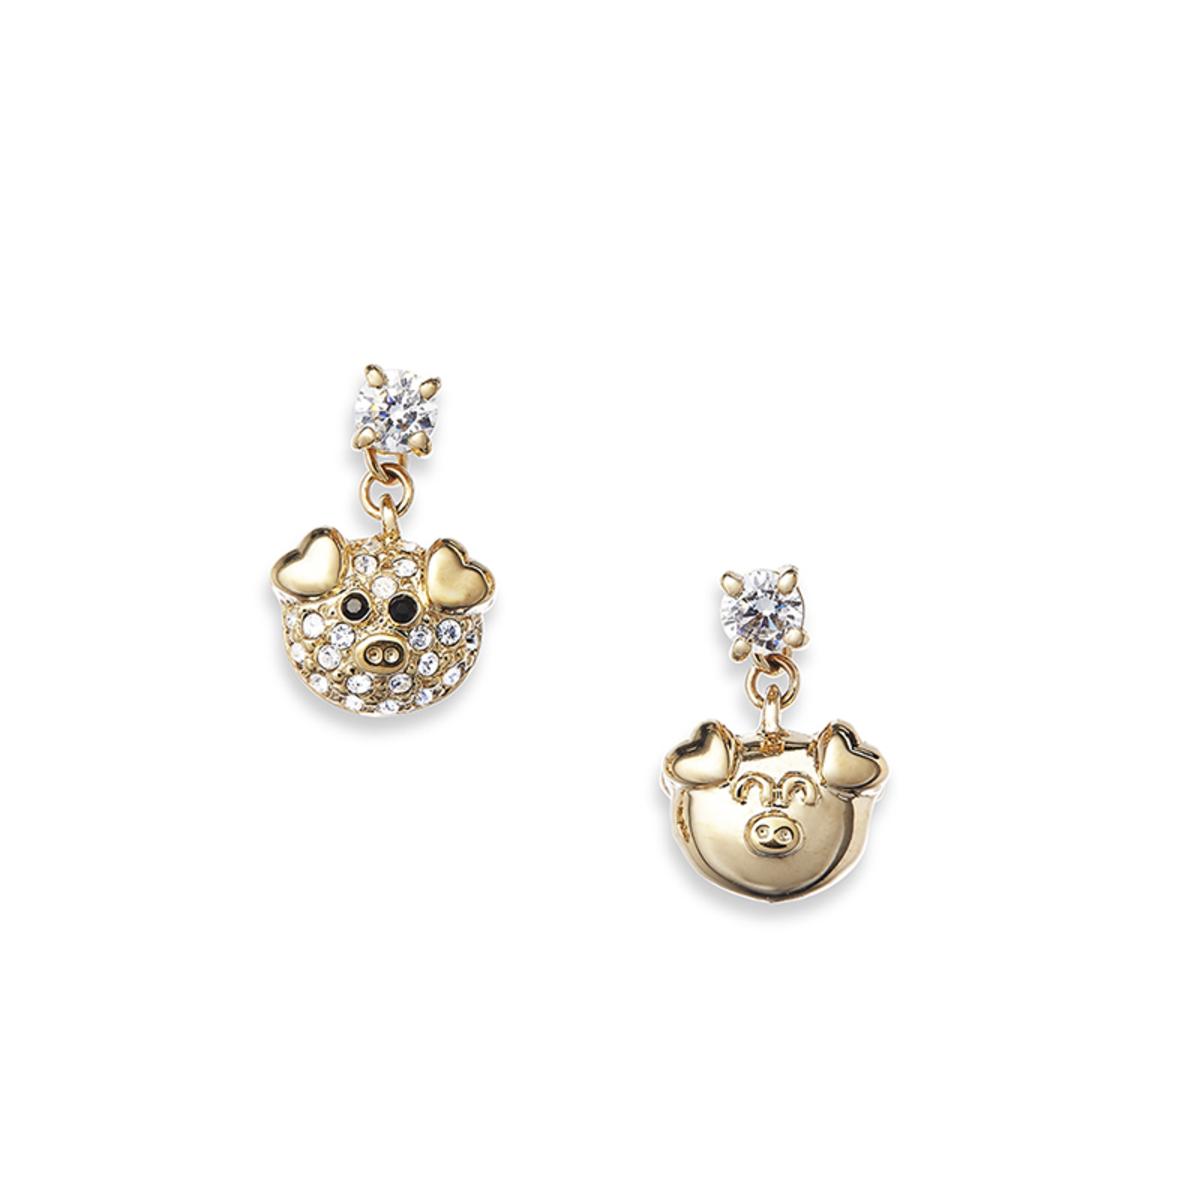 Petit Ami: gold plating, Swarovski crystal, CZ stone dounle face piggy pierced earrings